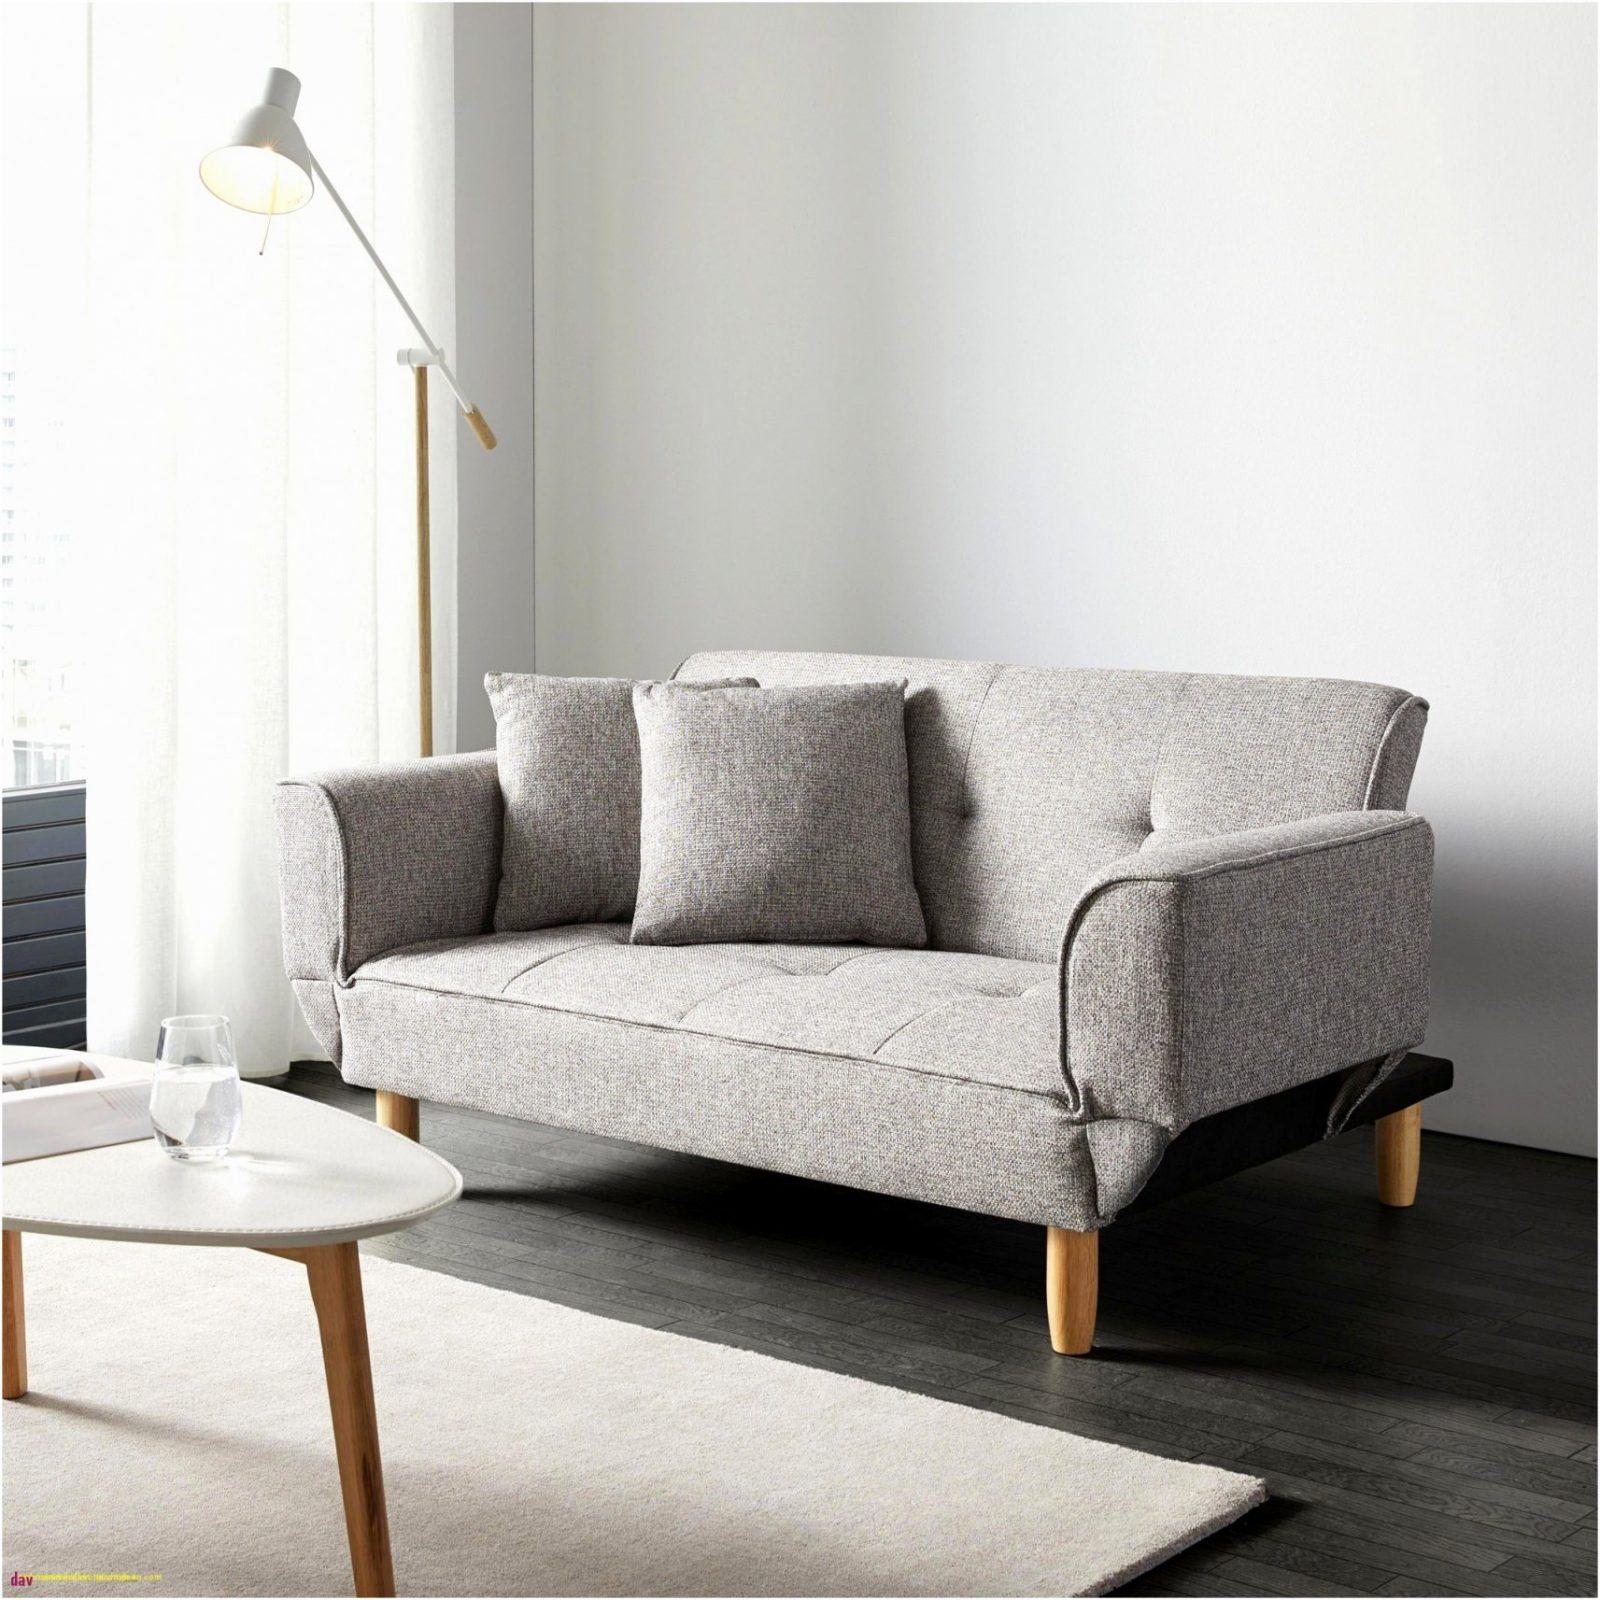 Big Sofa Hocker Poco von Big Sofa Poco Domäne Bild